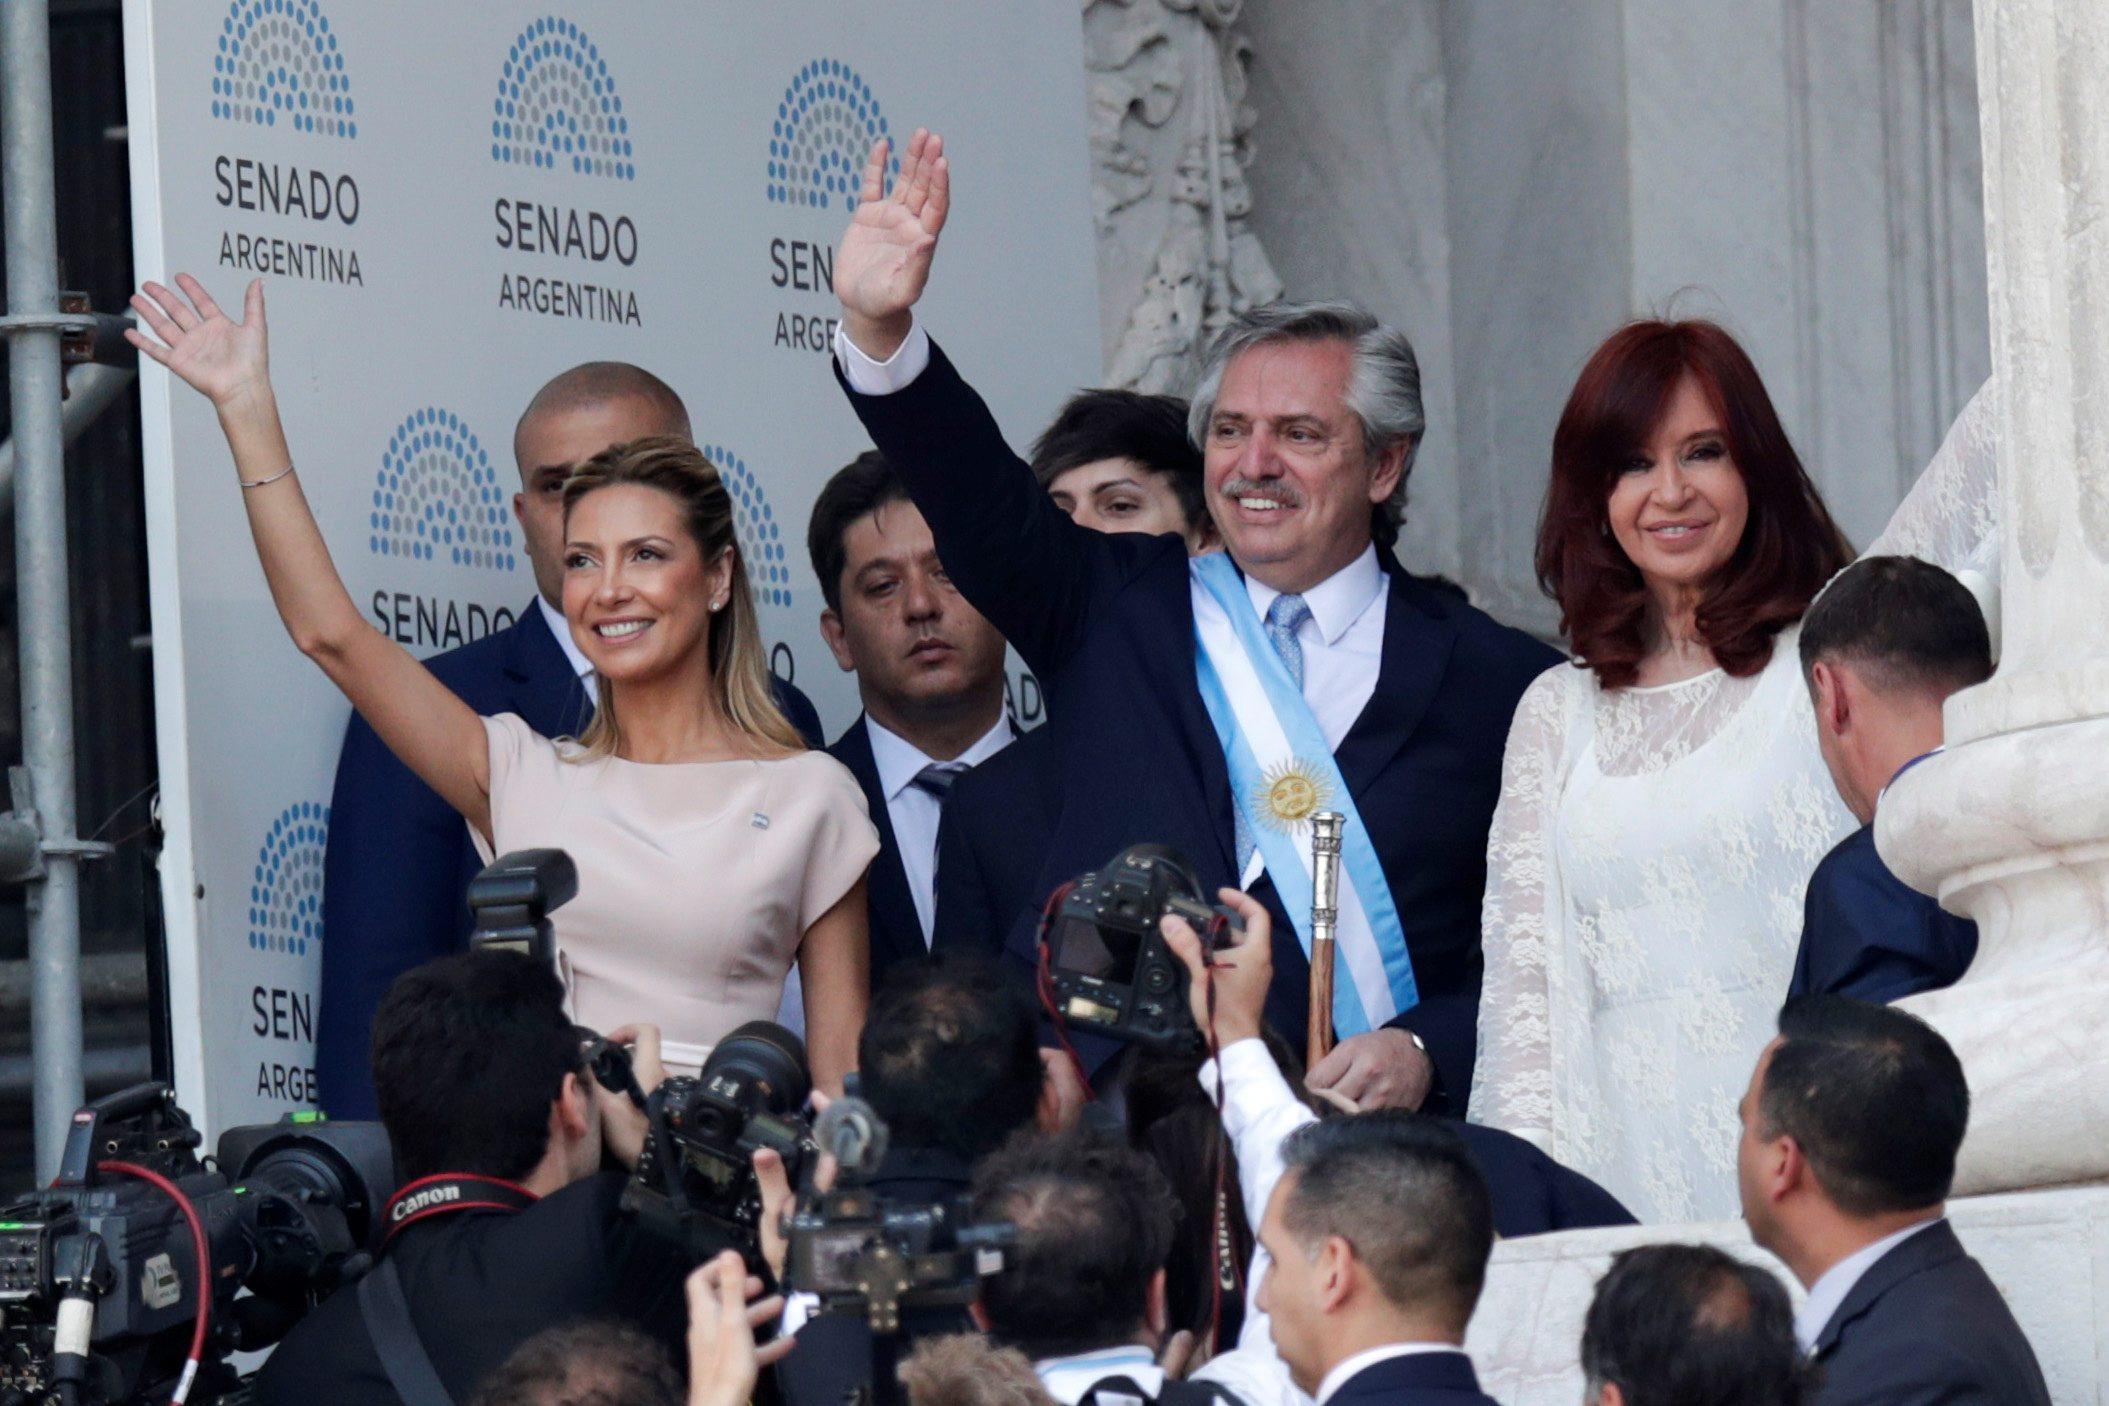 Alberto Fernandez, njegova partnerica Fabiola Yanez (lijevo) i Cristina Fernandez de Kirchner